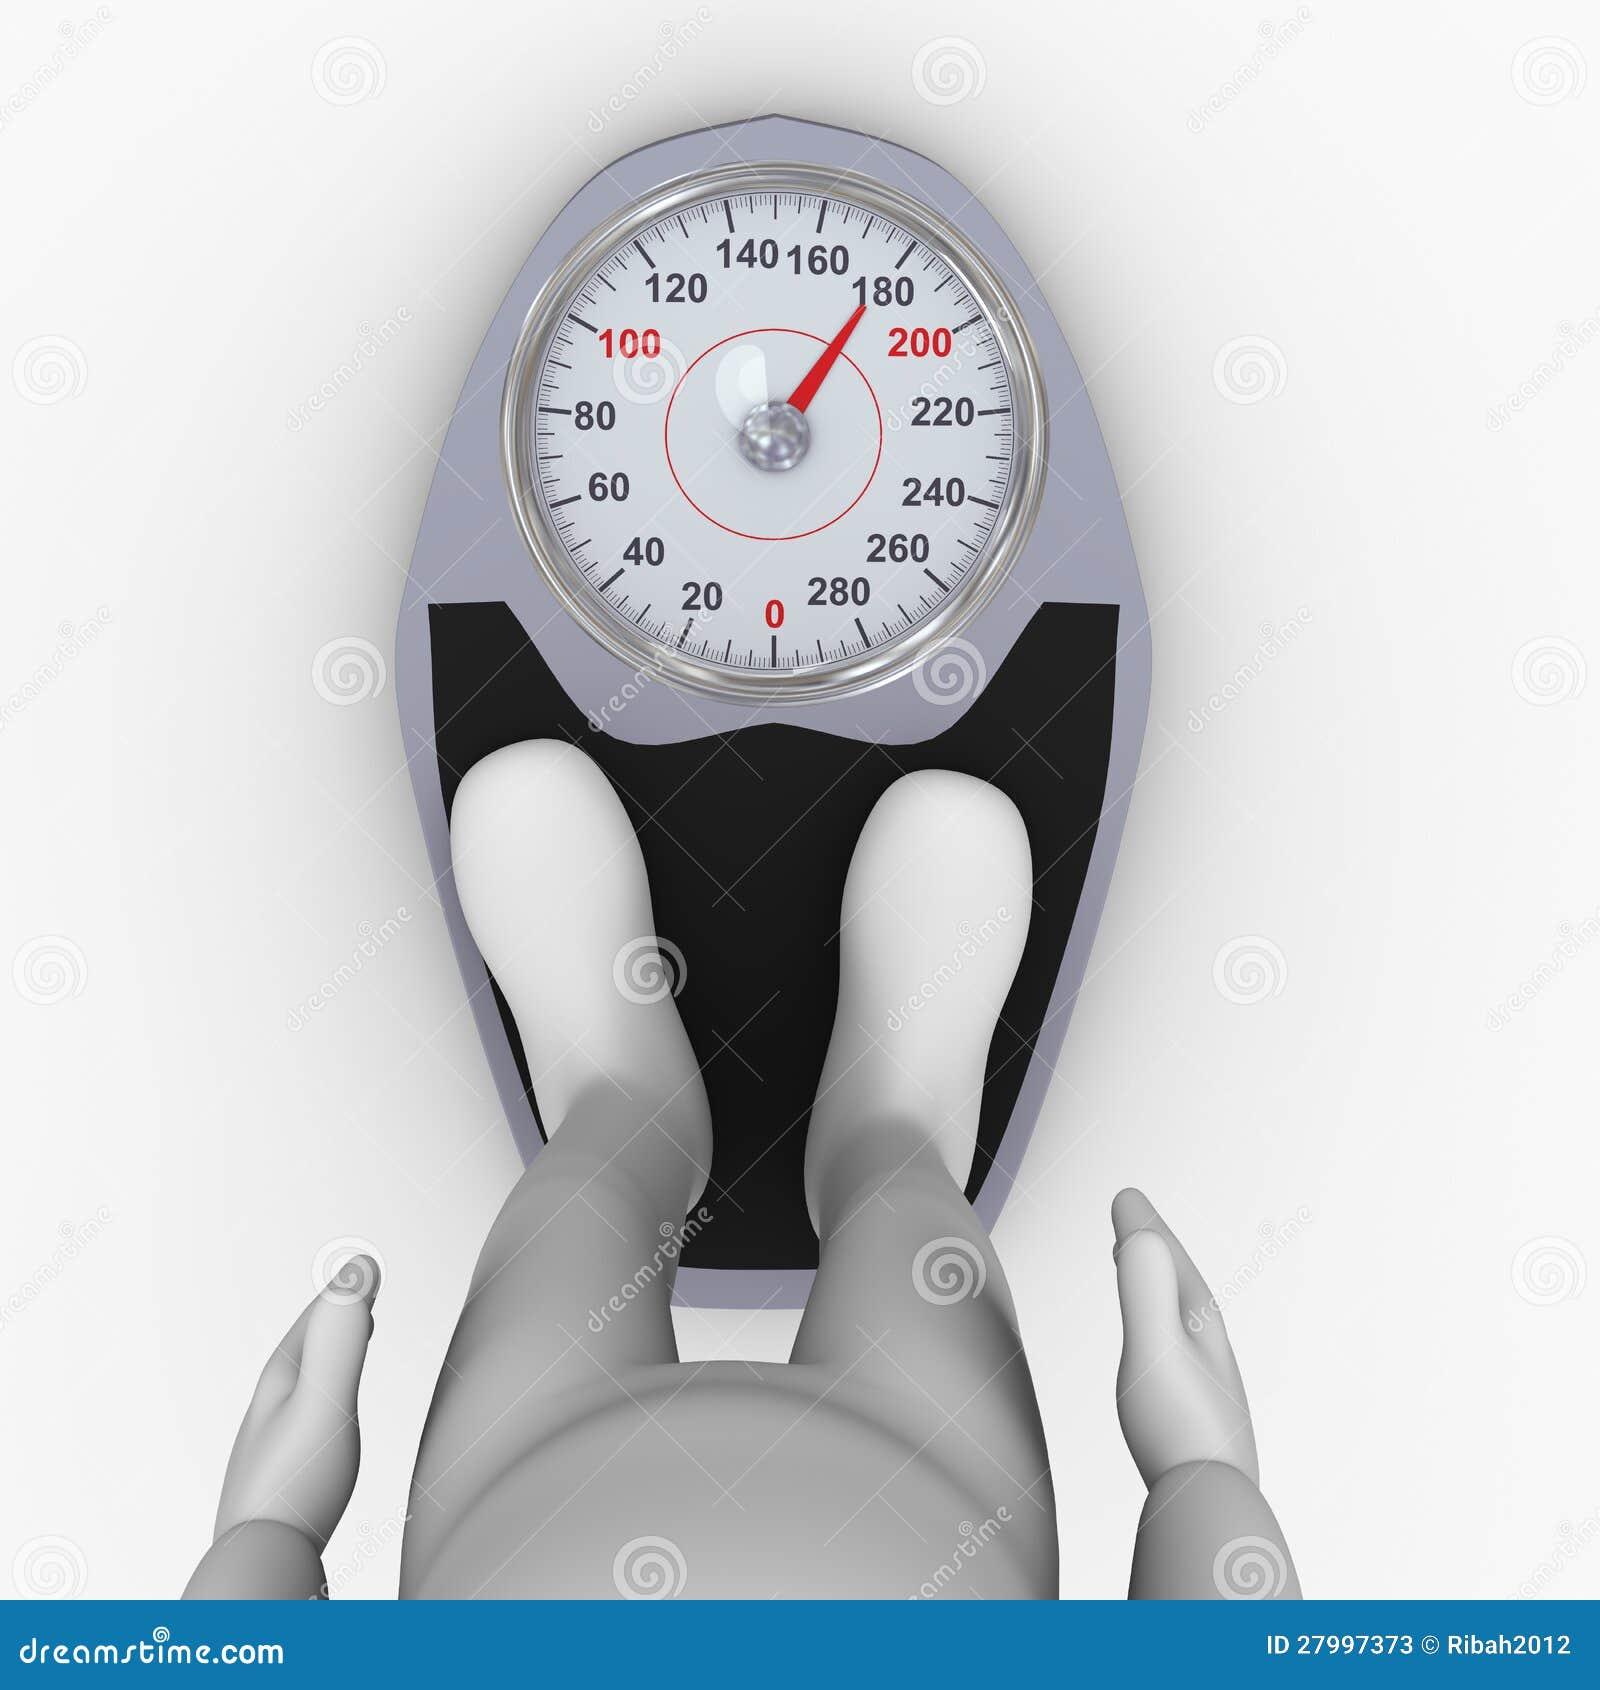 3d Man Feet On Bathroom Weight Scale Stock Photos - Image ...